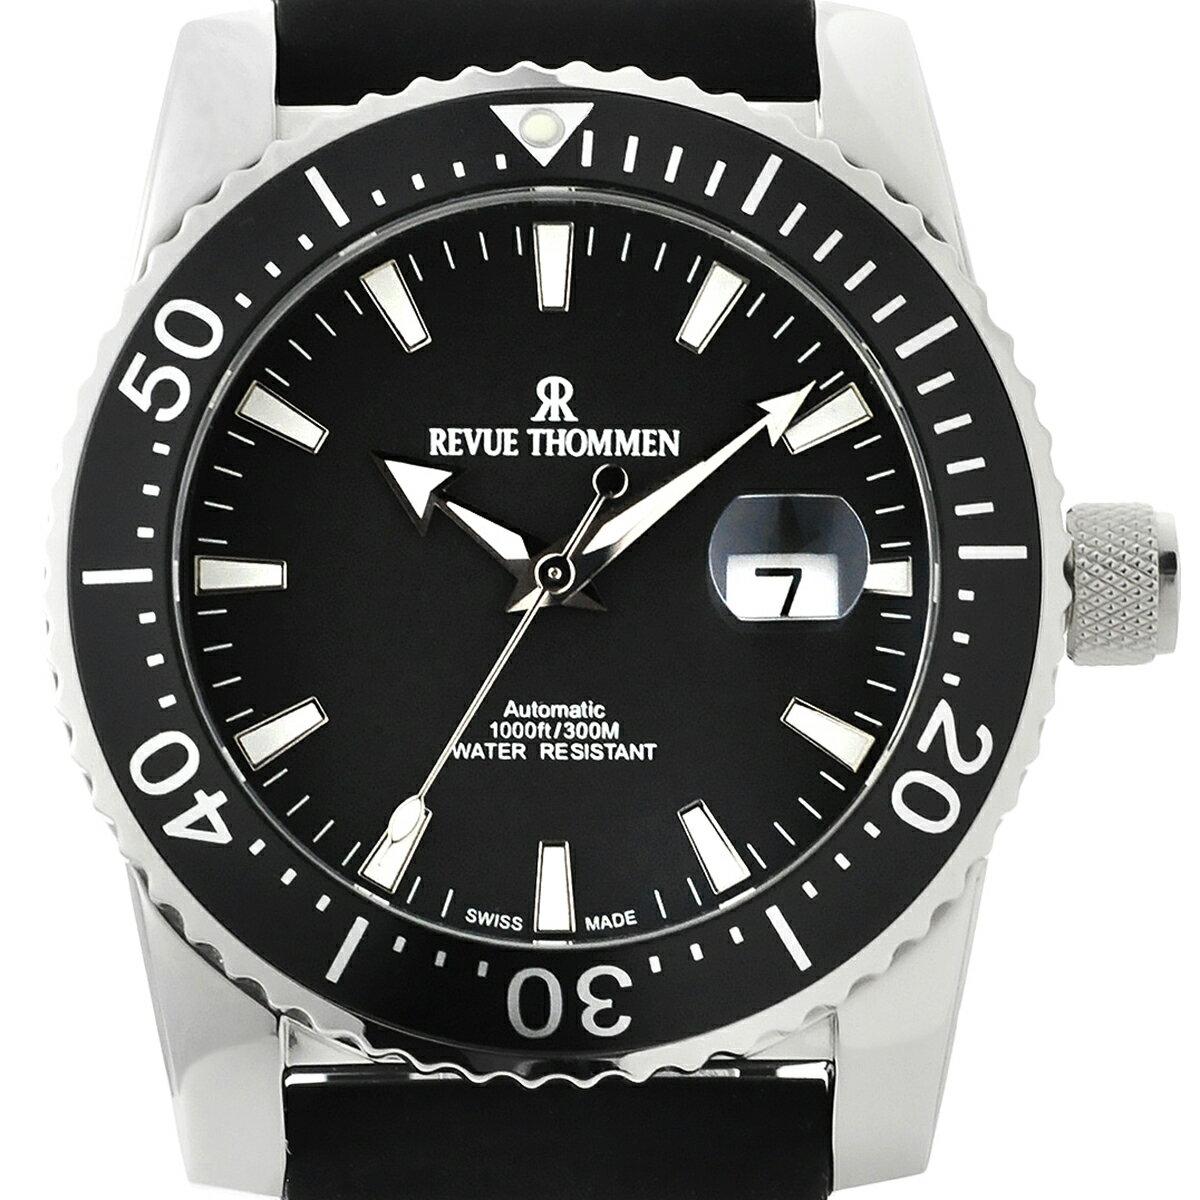 Revue Thommen レビュートーメン 自動巻き(手巻き機能あり) 腕時計 [17030-2537] 並行輸入品 デイト 逆回転防止ベゼル ダイバーズ